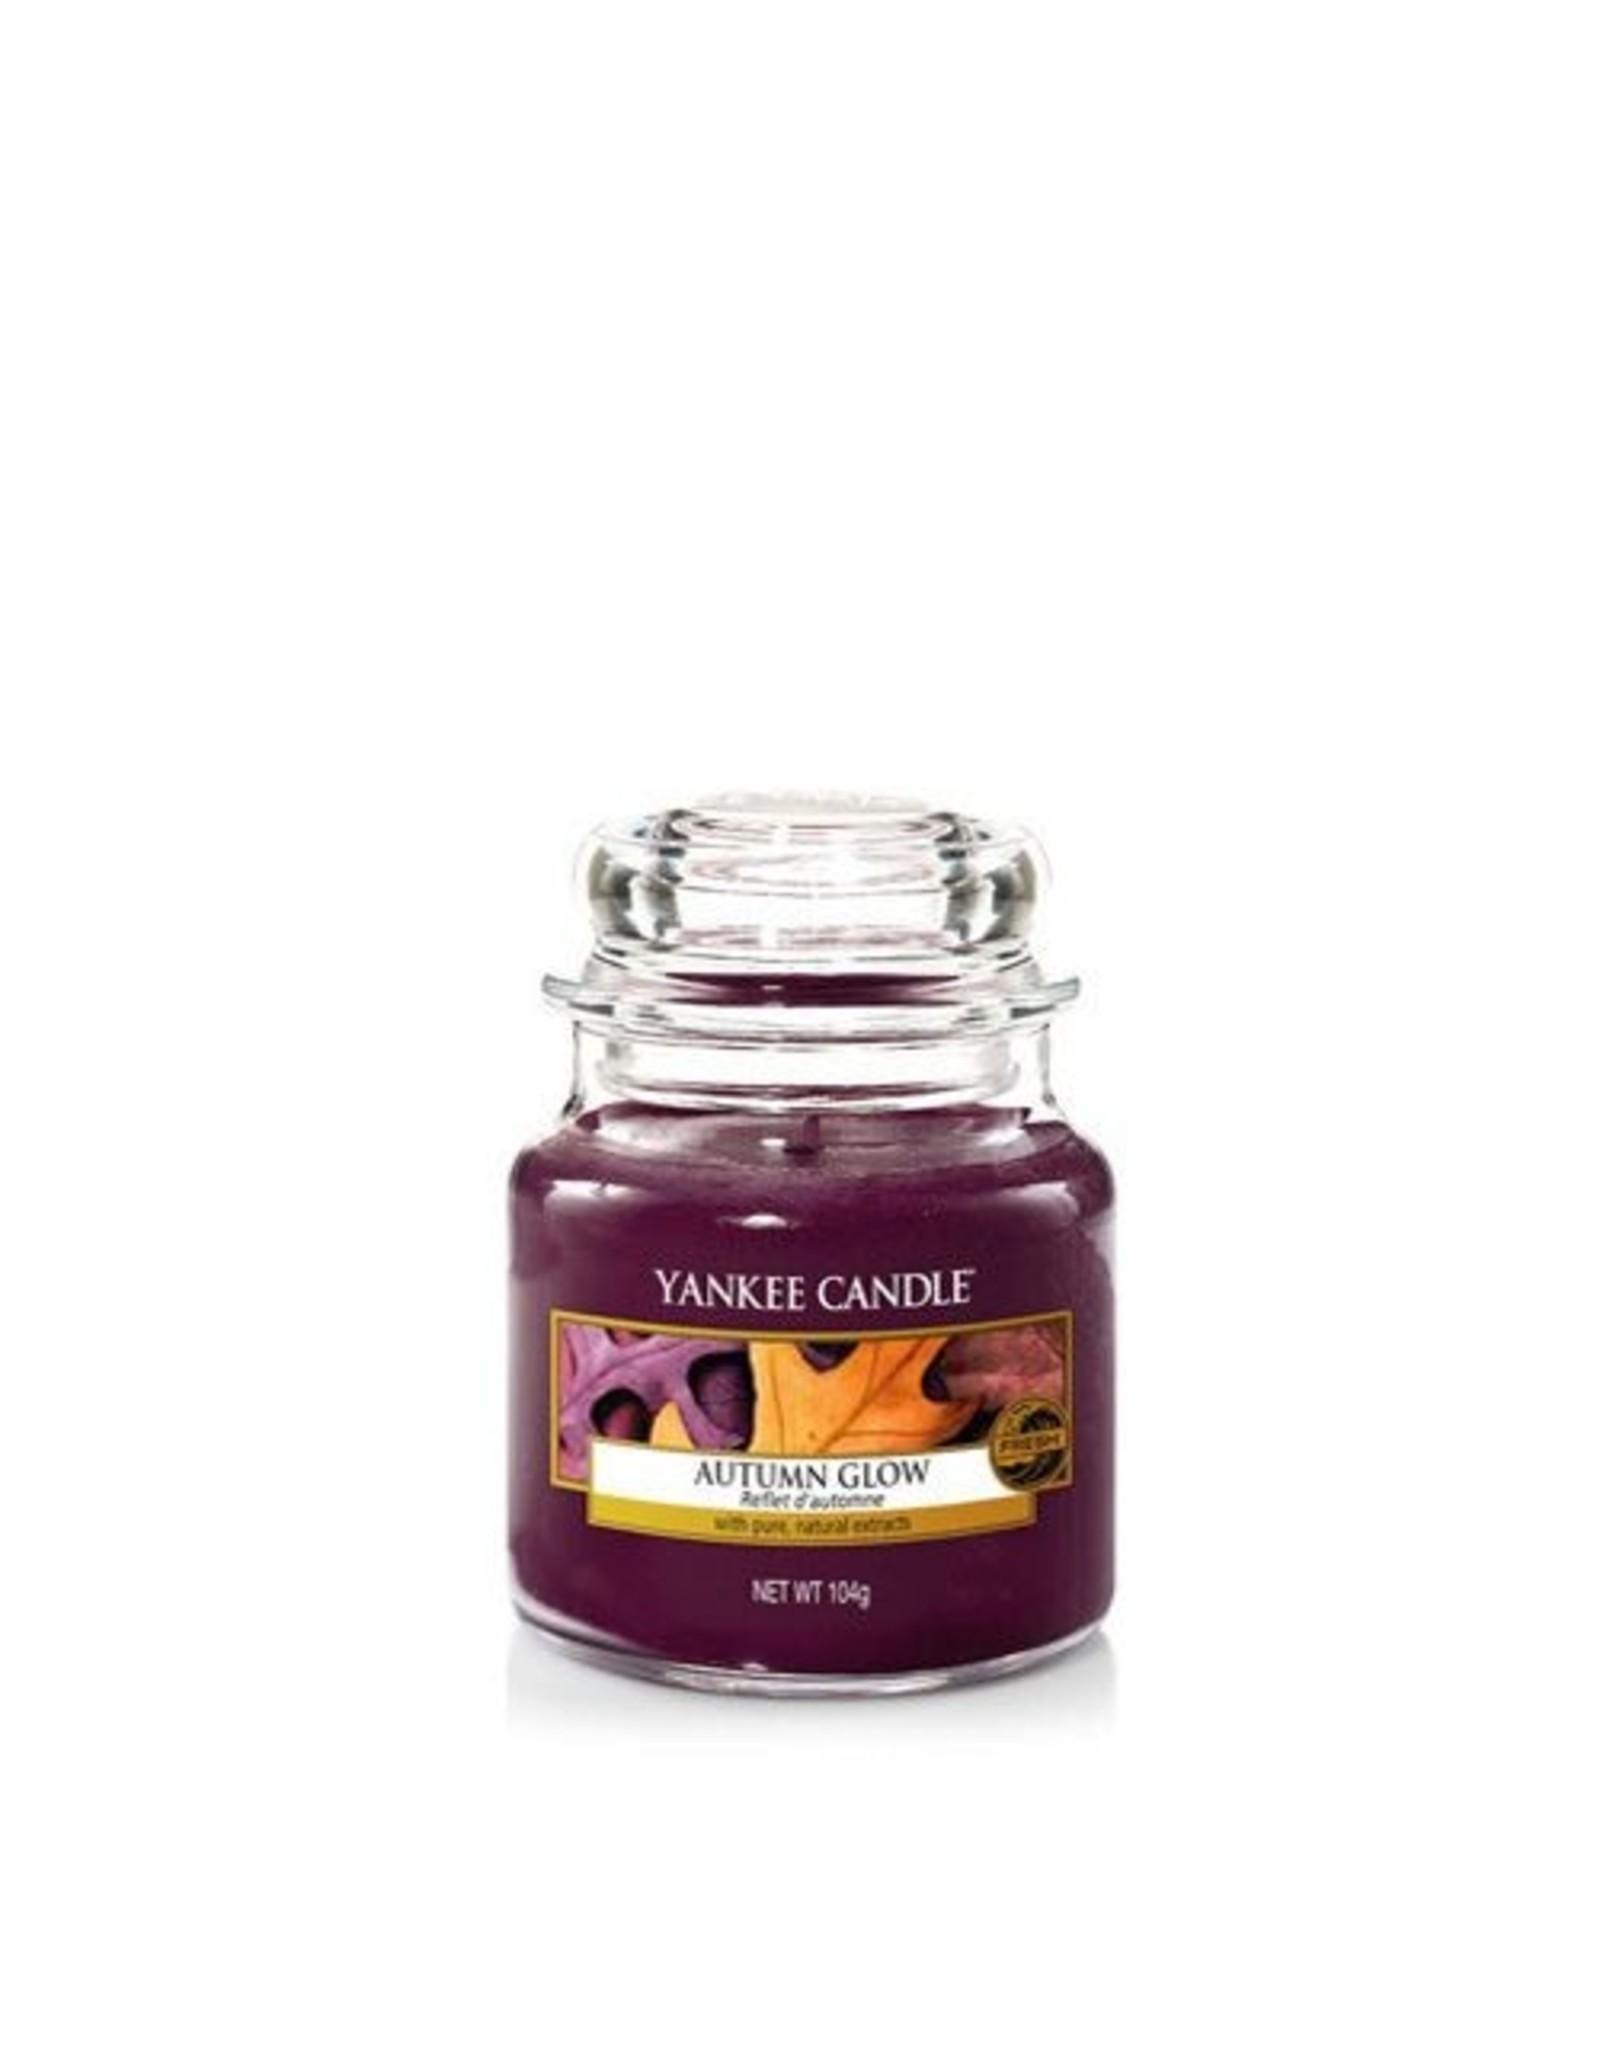 Yankee Candle Autumn Glow Small Jar